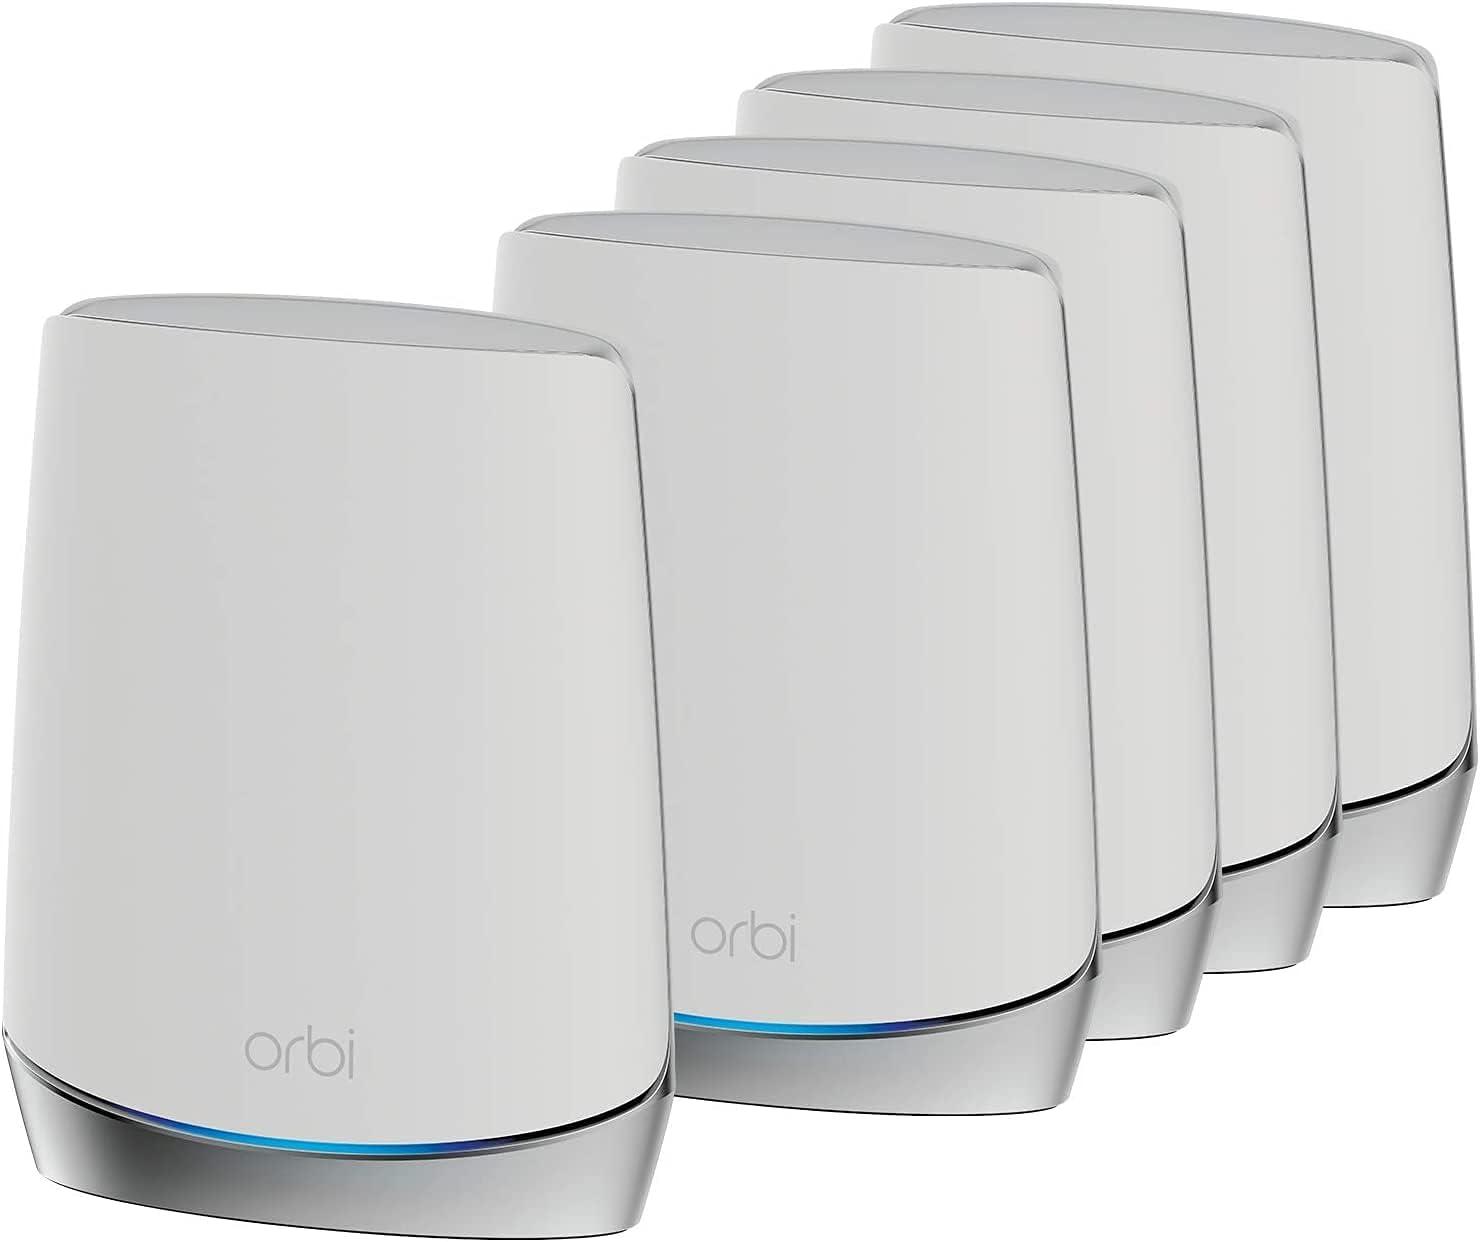 NETGEAR Système WiFi 6 Mesh Tri Bandes Orbi (RBK755), Pack de 5,...